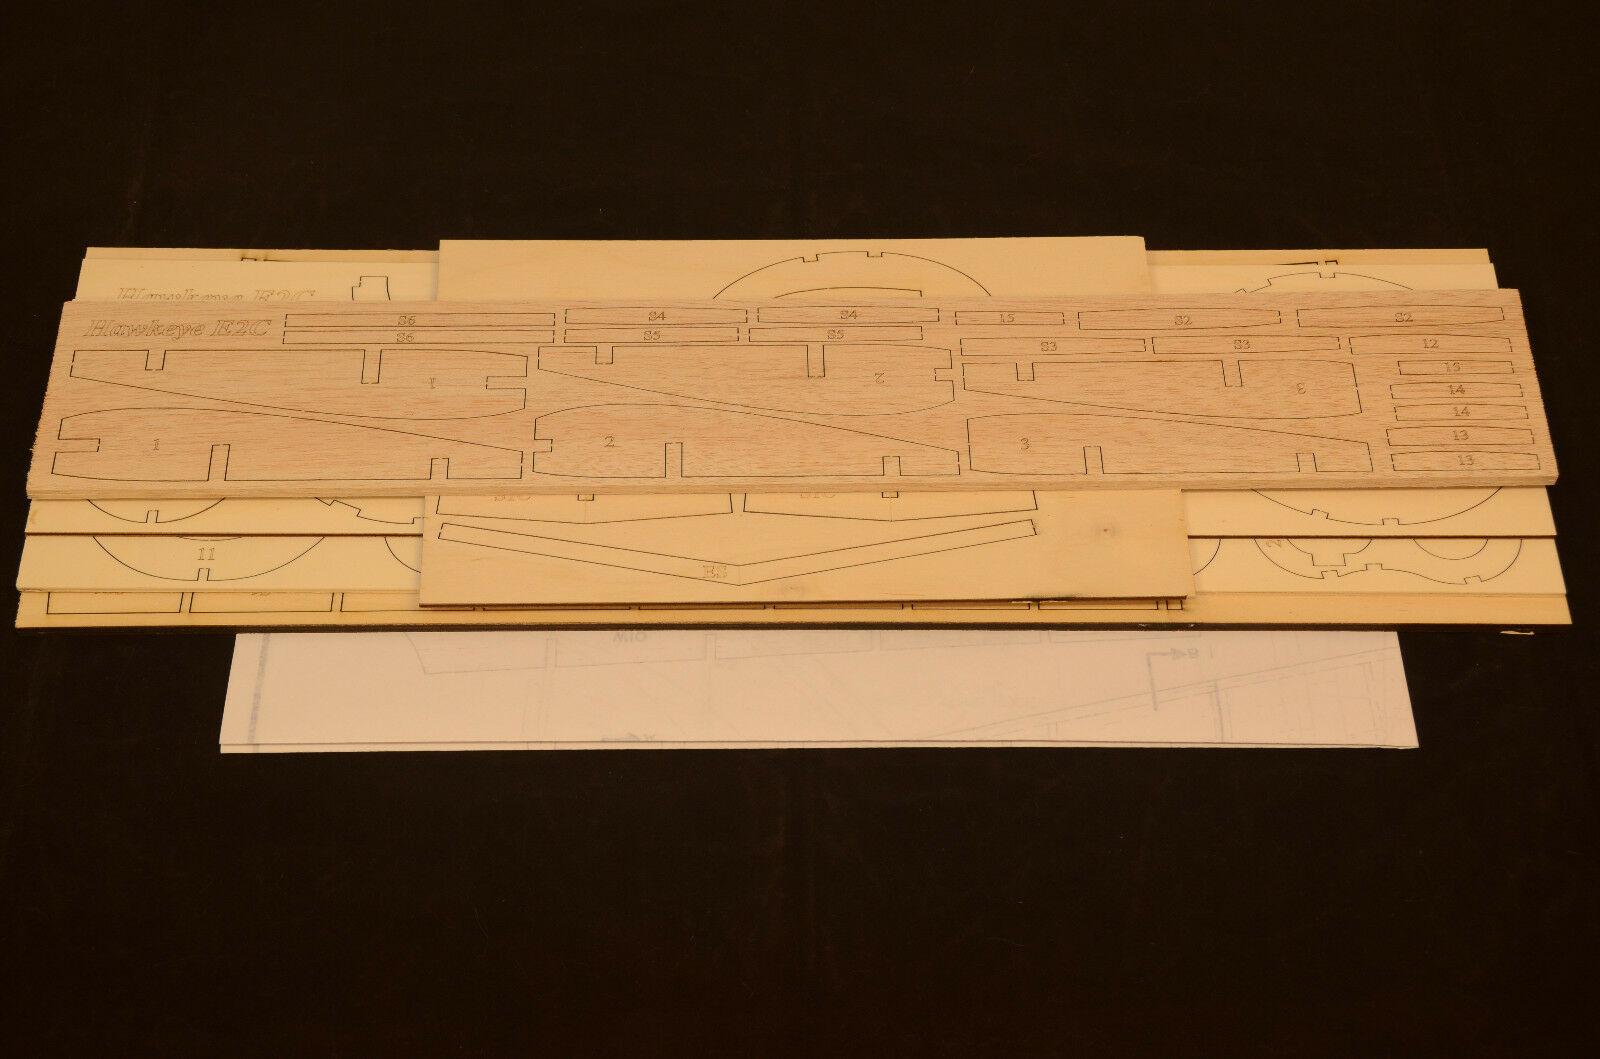 1 16 Scale GRUMMAN E2C HAWKEYE Laser Cut Short Kit & Plans 59.5 WS ELECTRIC